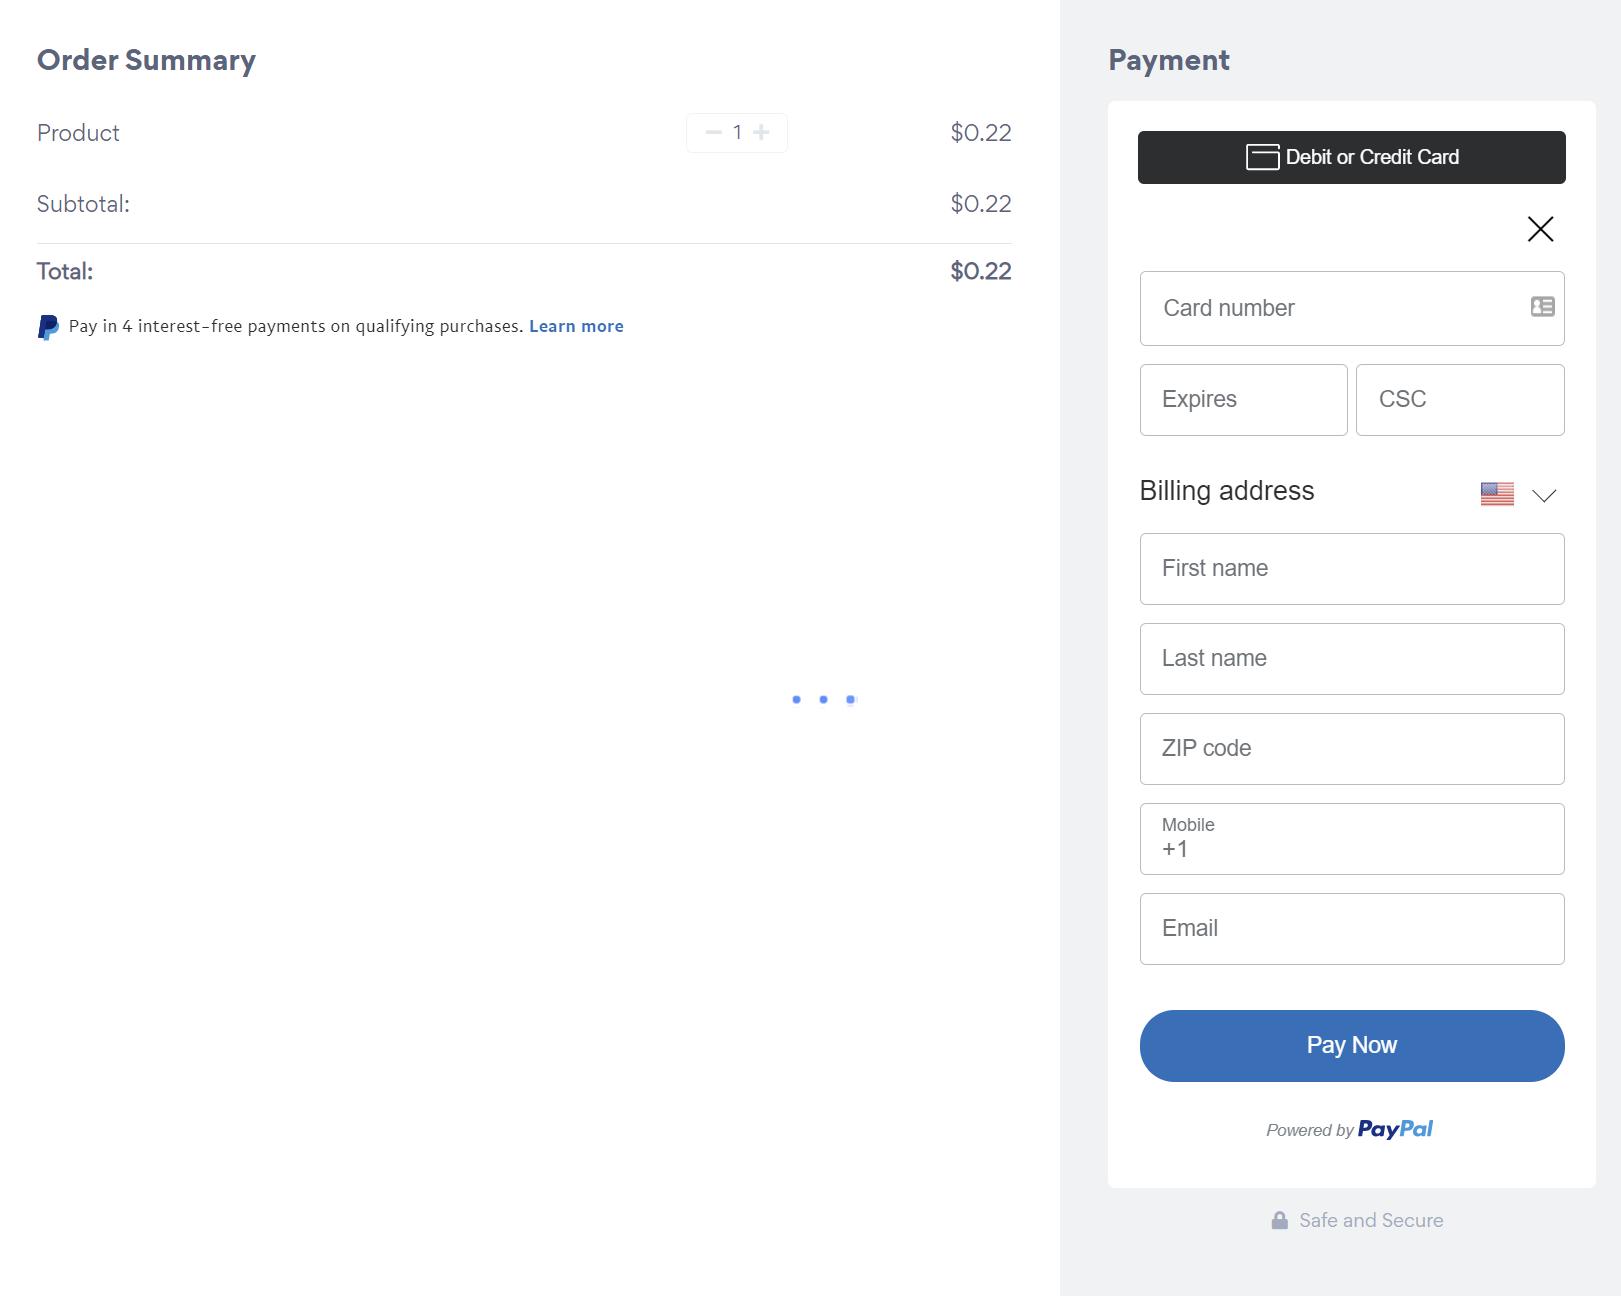 paypal-pcp-credit-or-debit-card